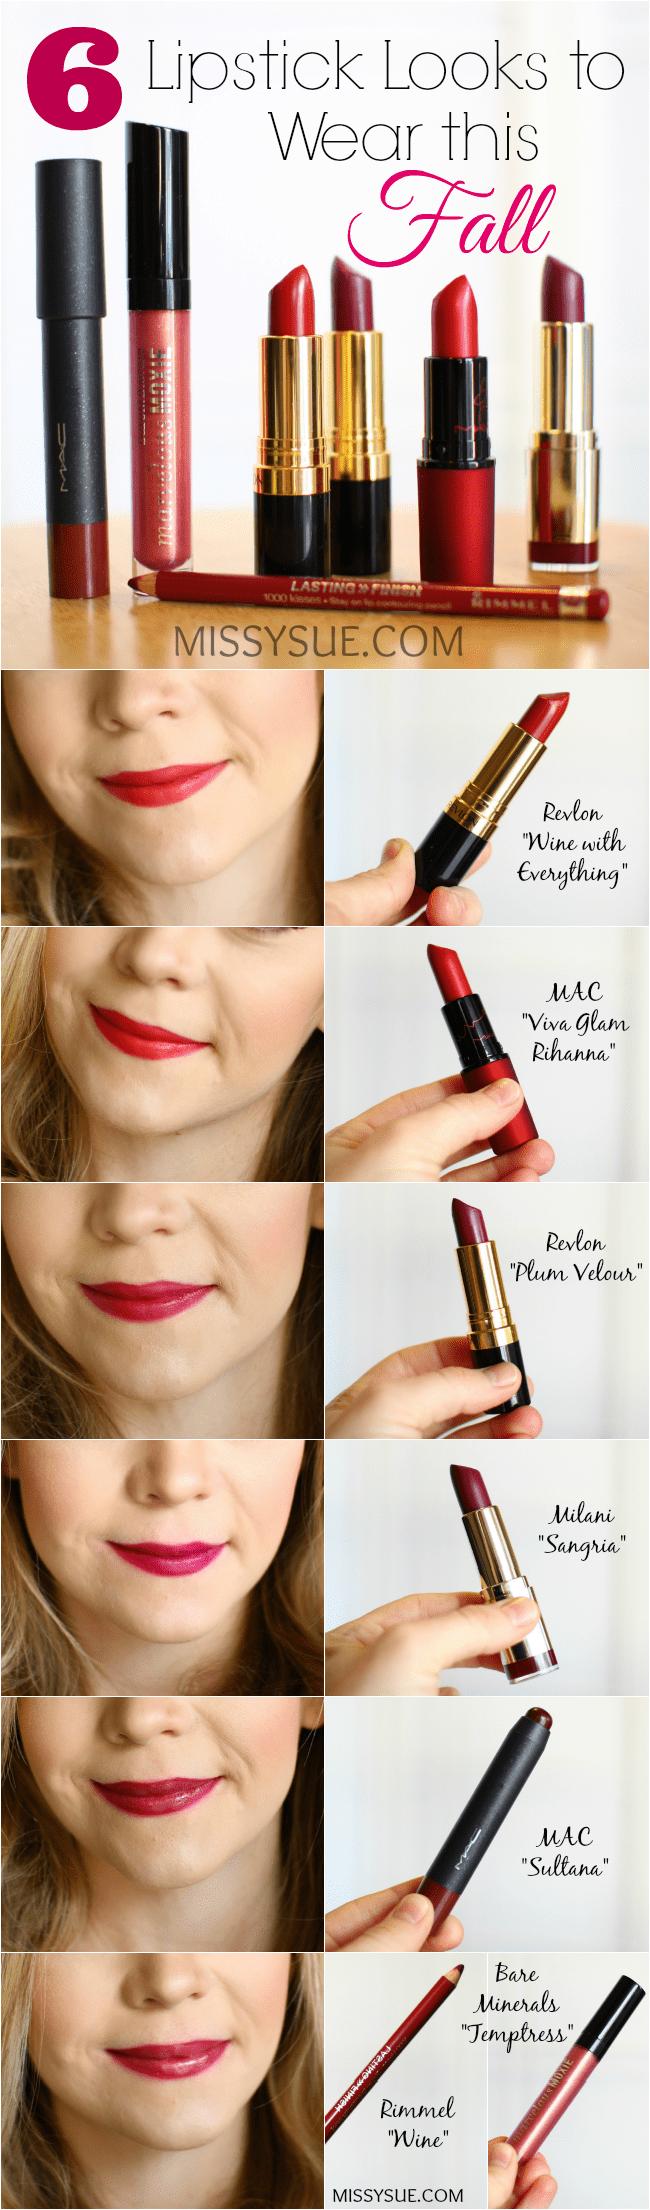 Fall Lipstick Shades | MissySue.com